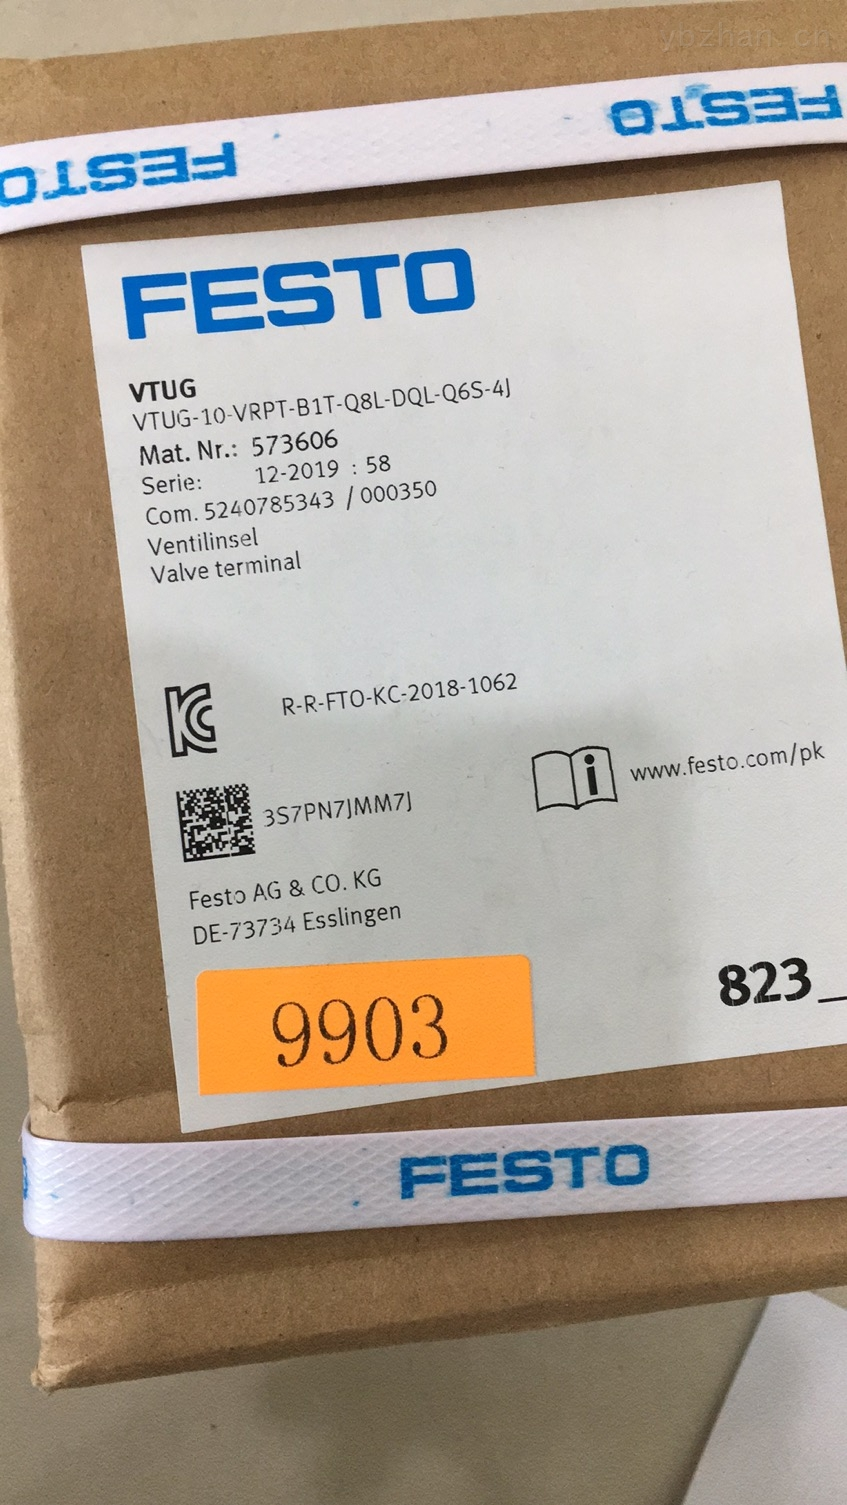 FESTO真空发生器订货方式